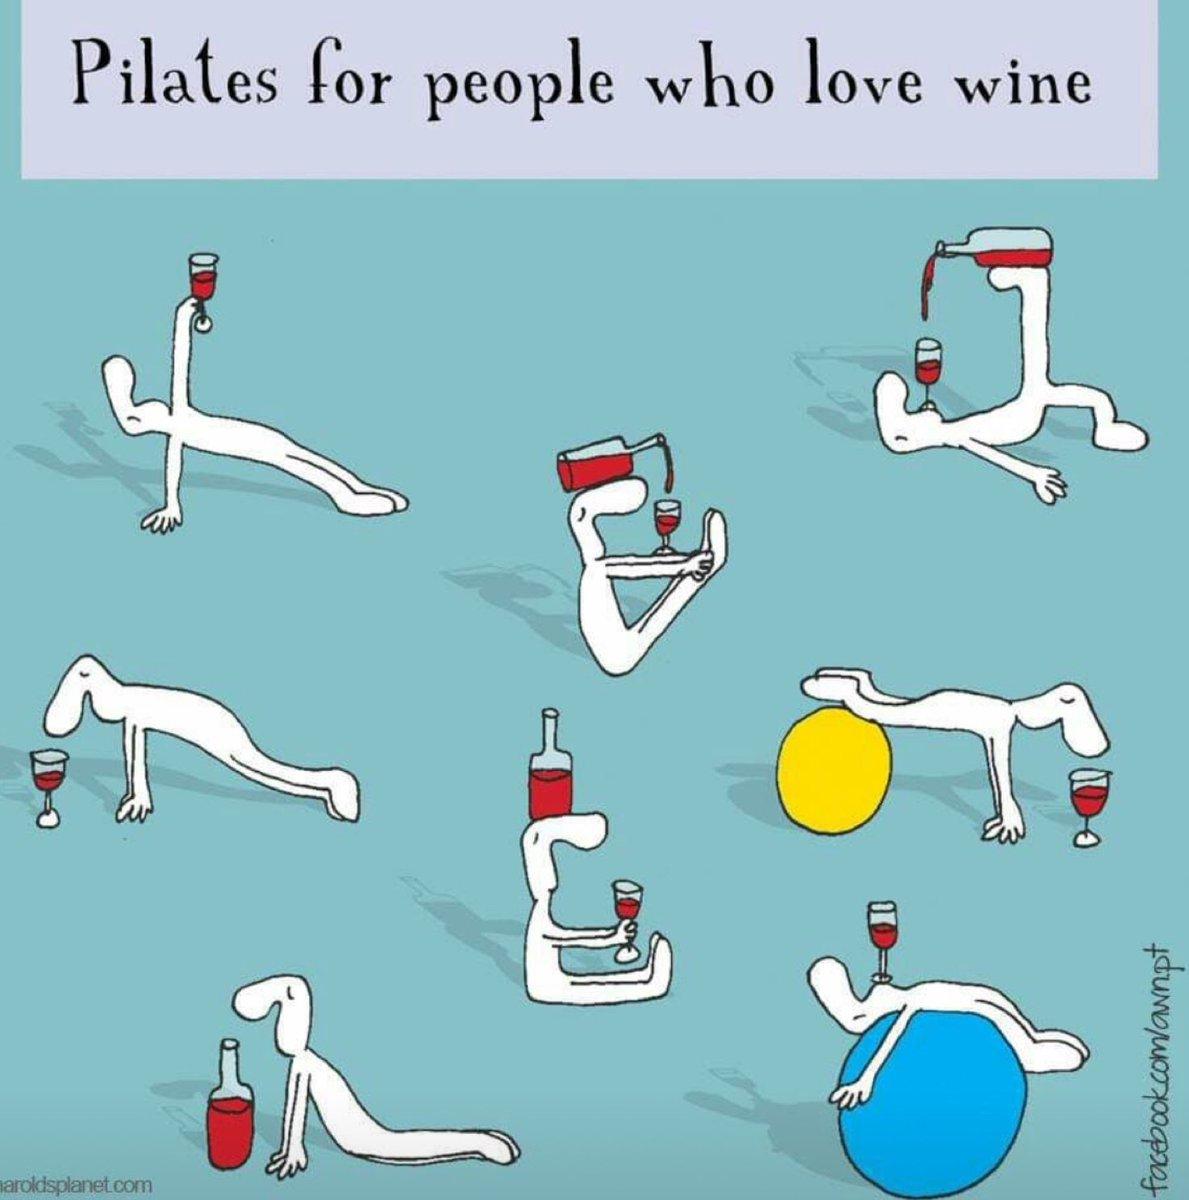 😂😂😂 #pilates #fitness #wine                Love this ❤️🍷🍷🍷🍷🍷